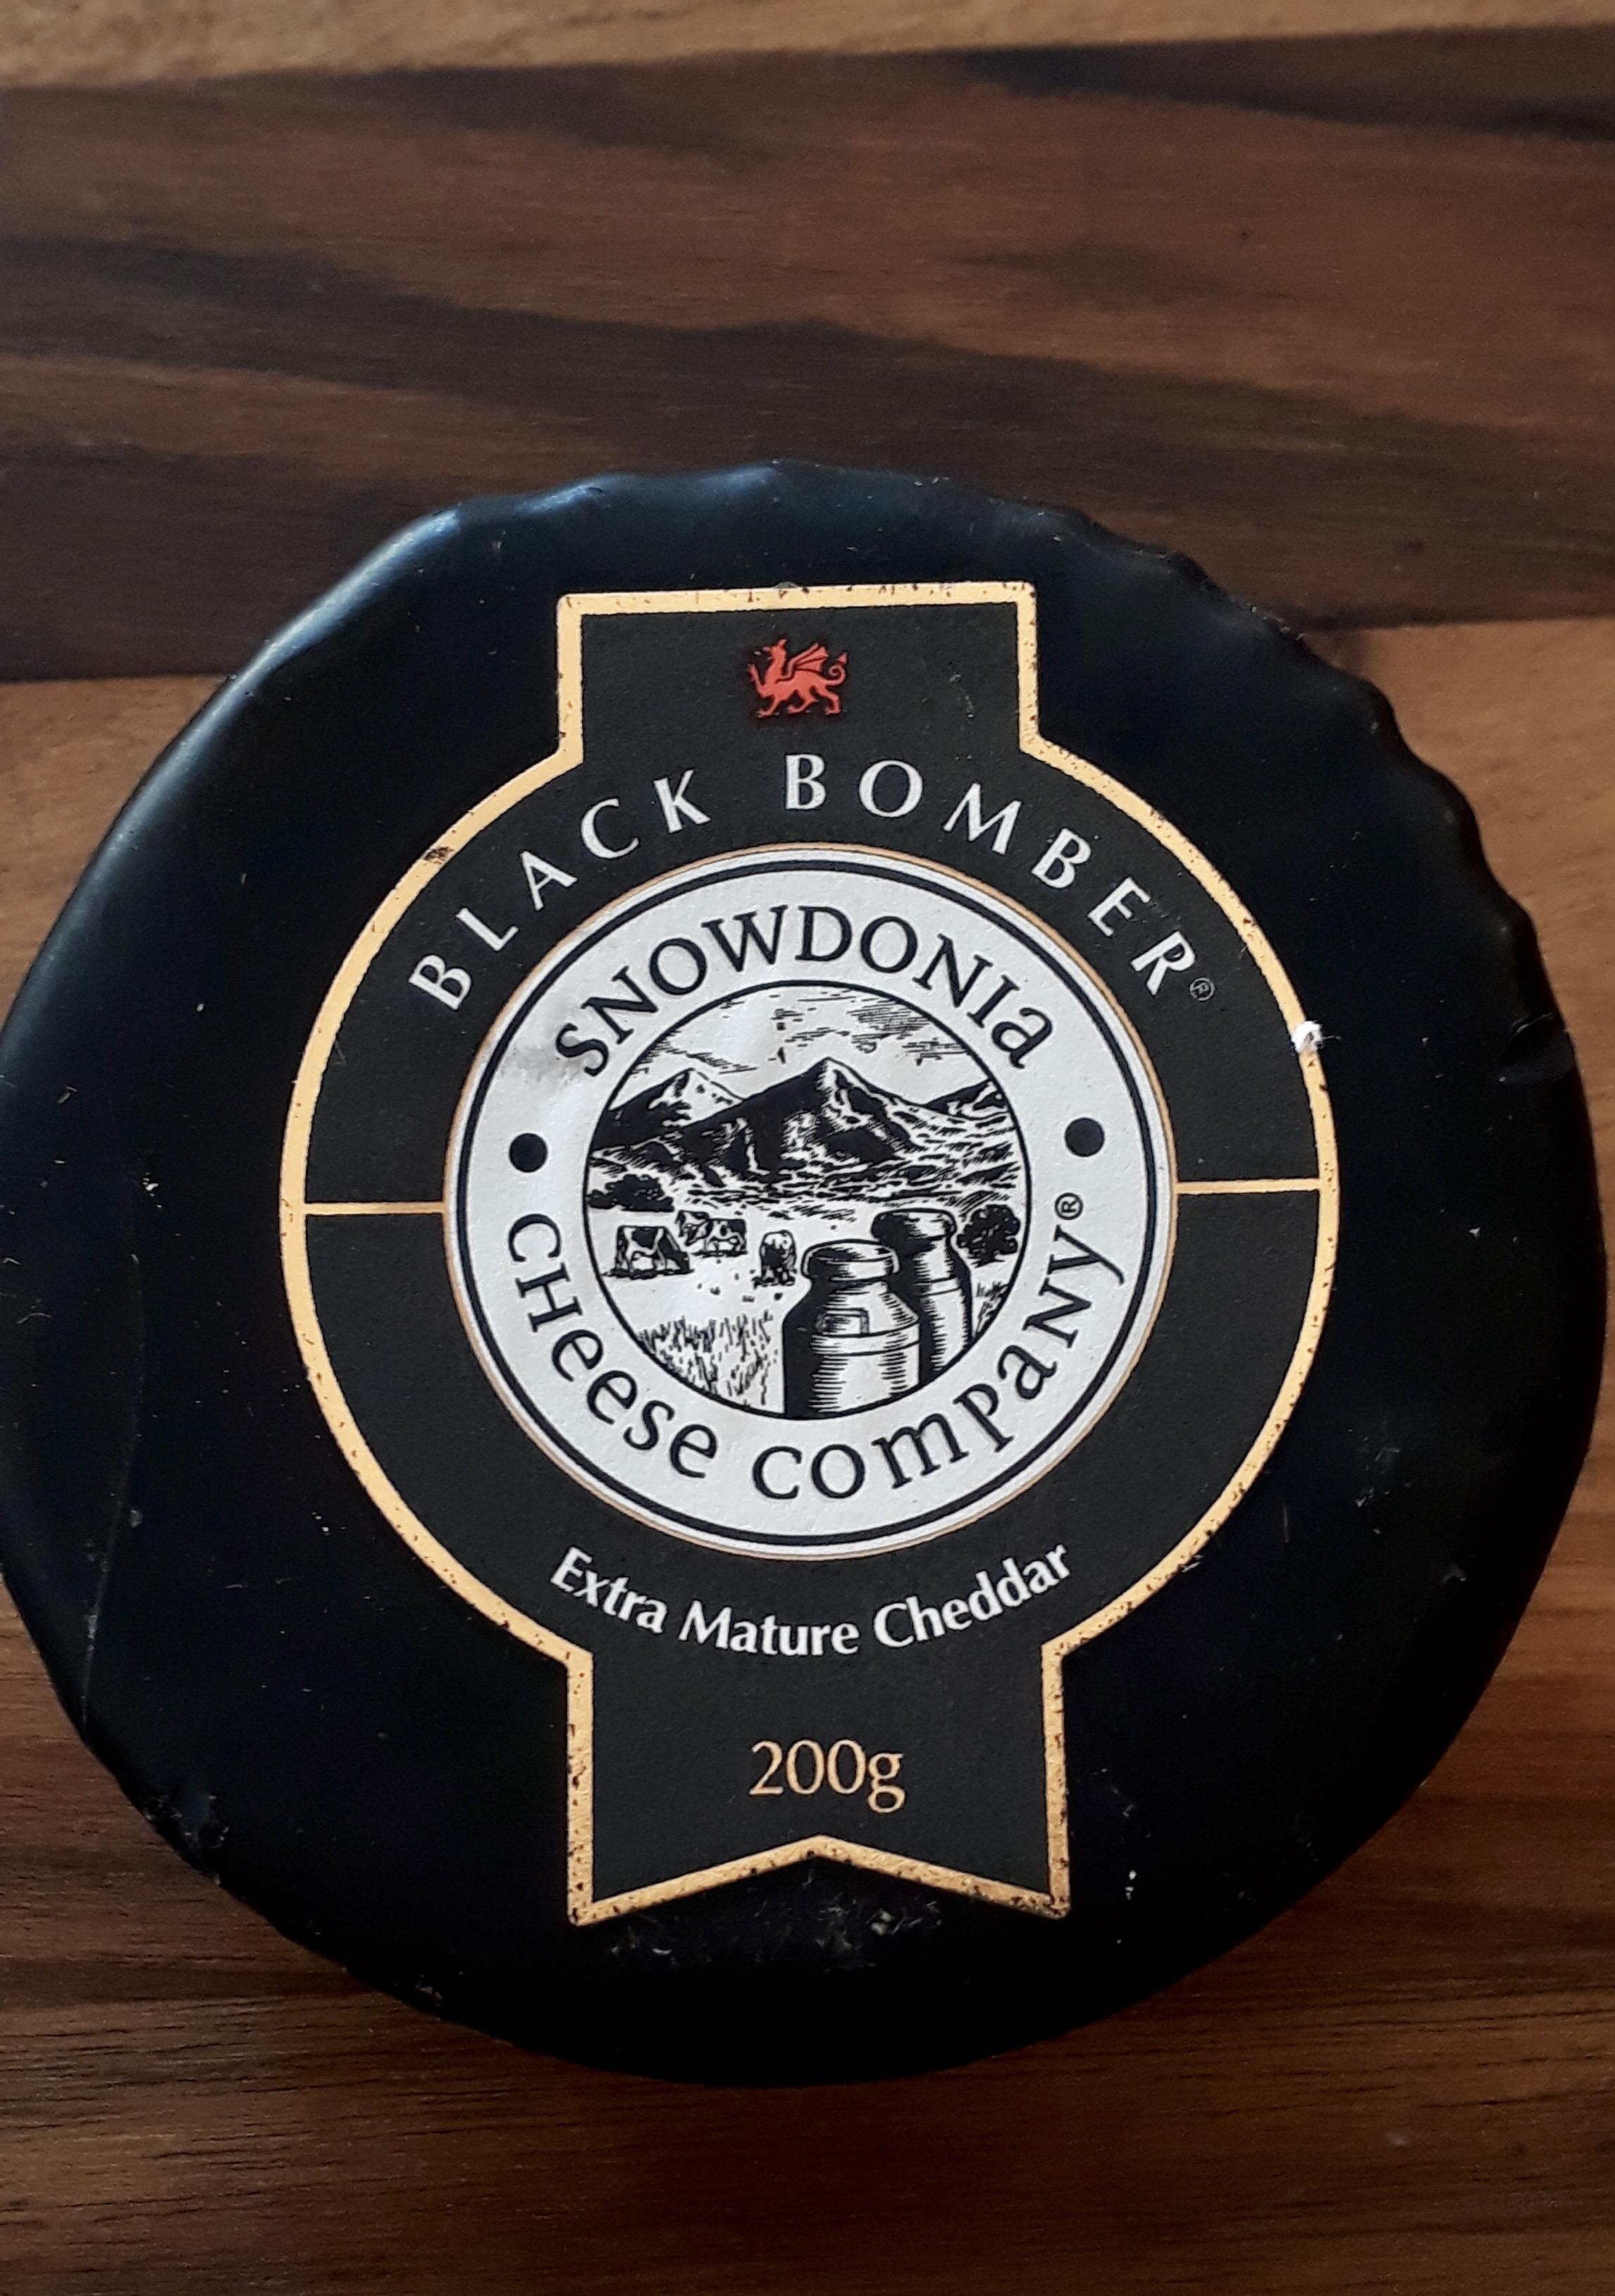 Black Bomber Snowdonia